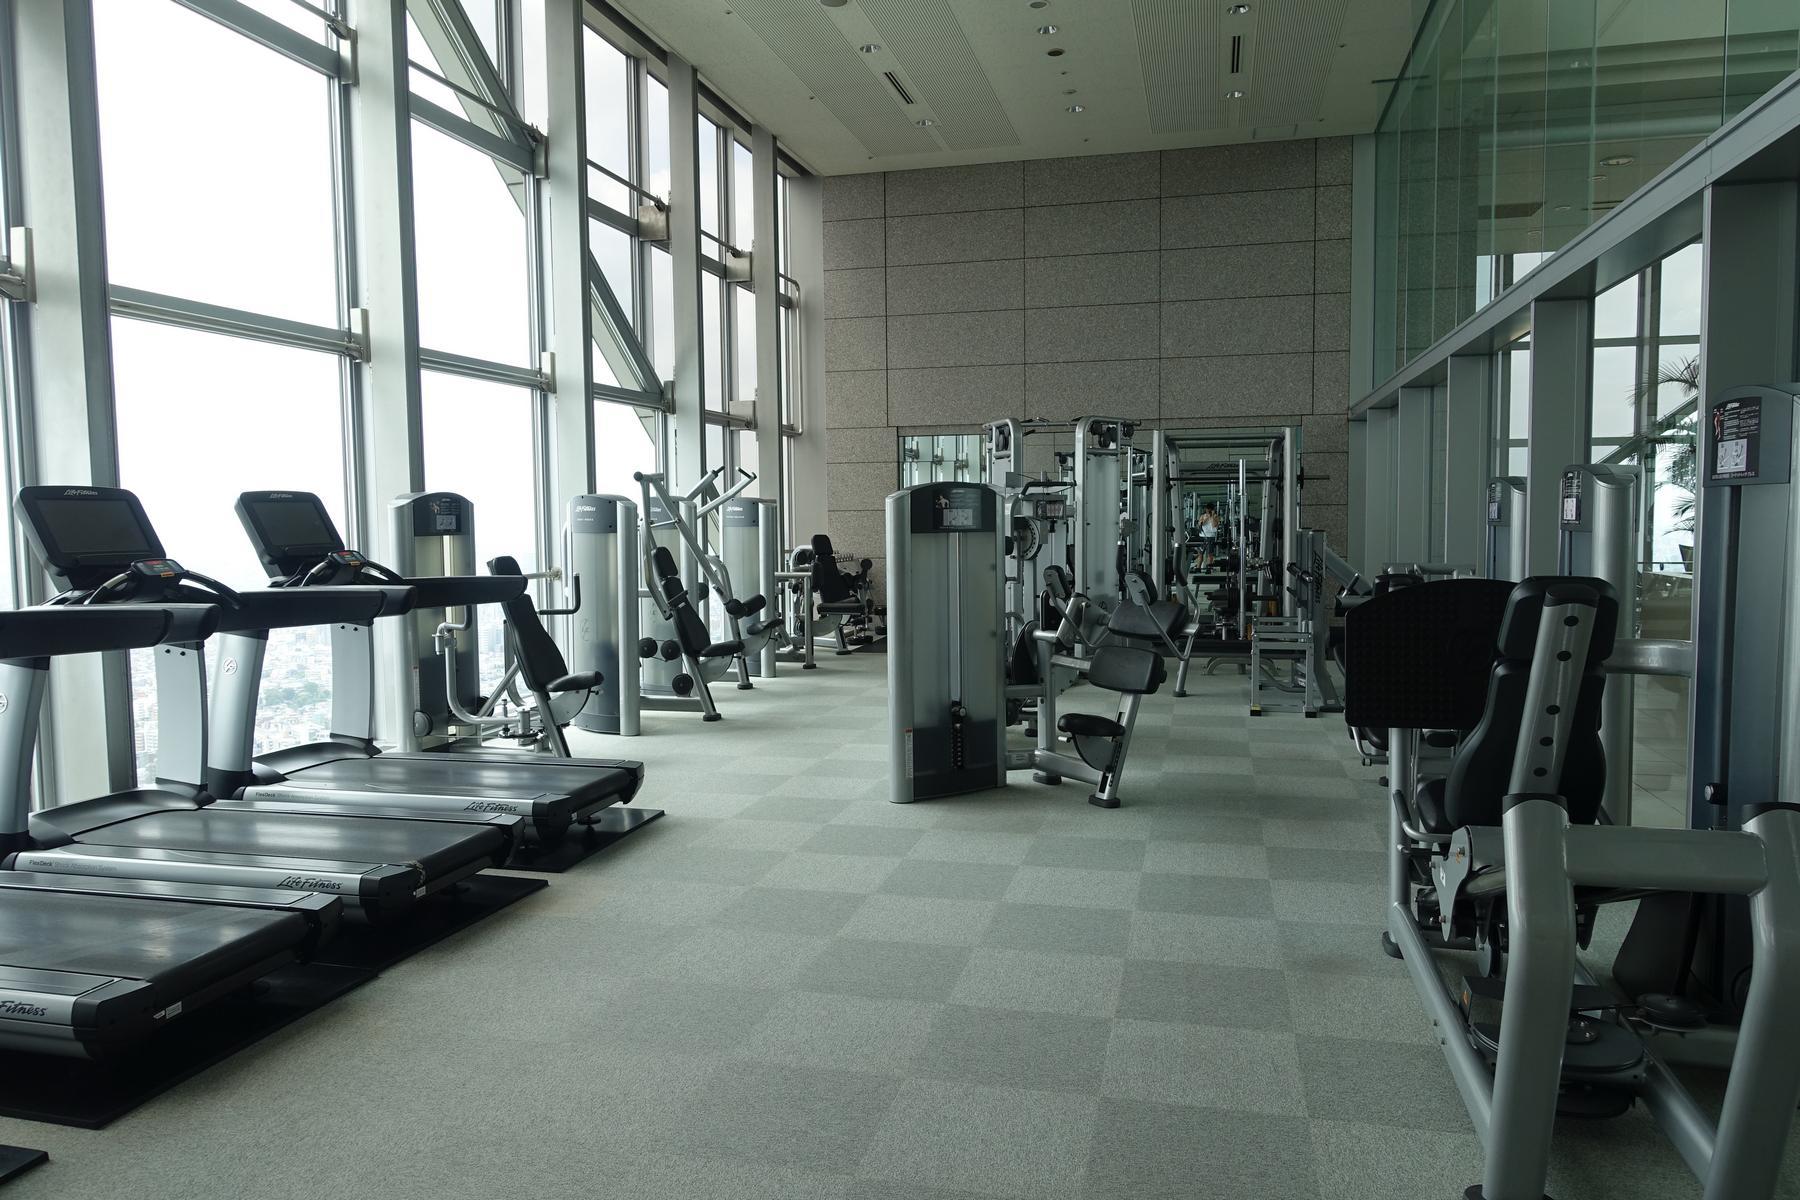 Hyatt park gym - Longwell green swimming pool times ...